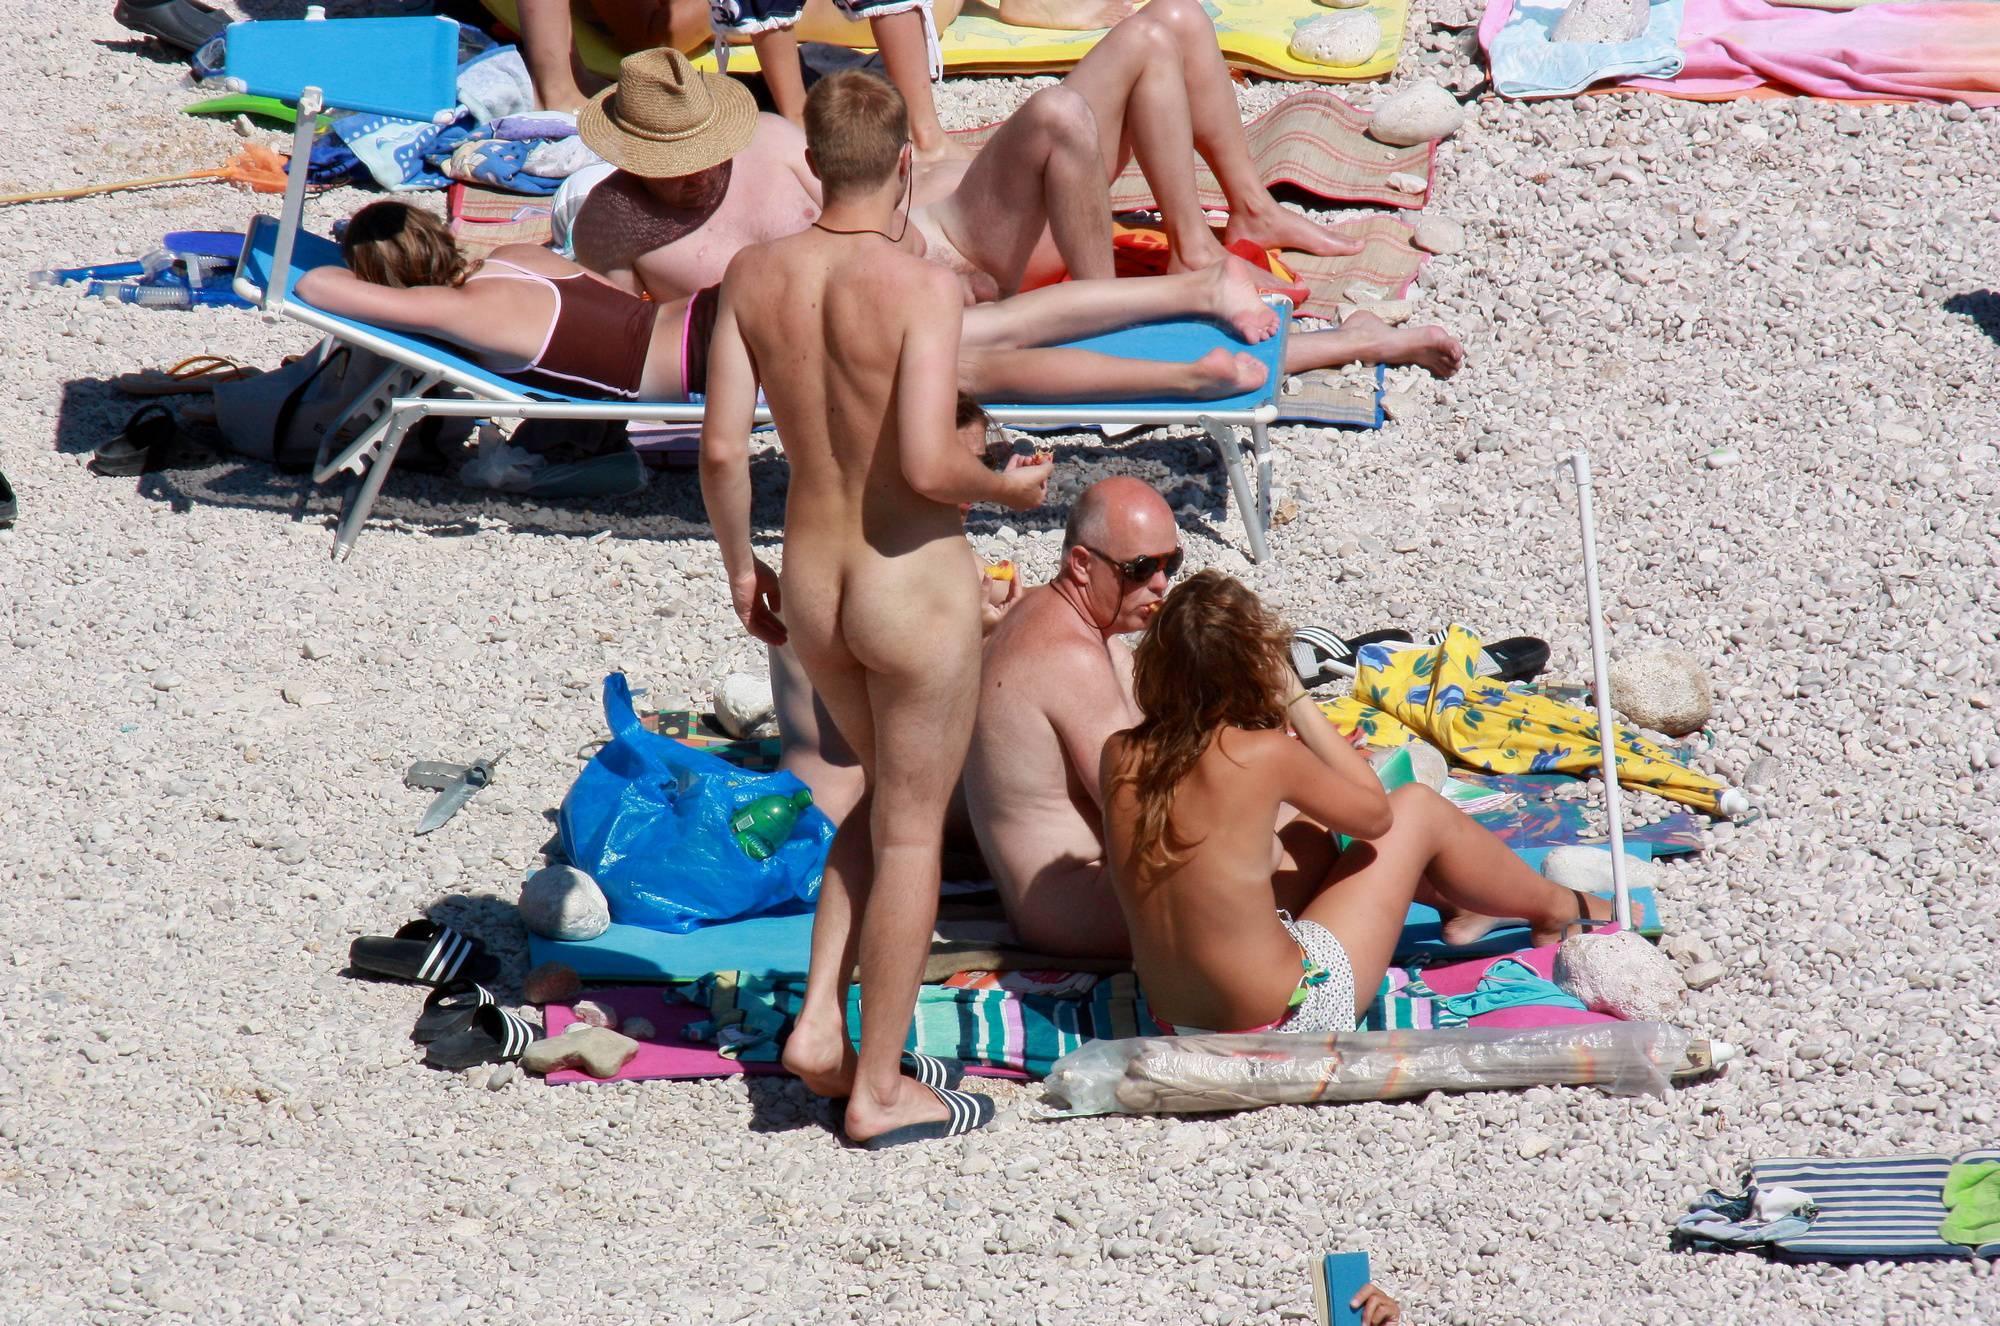 Nudist Pics Family Sand Camp Ground - 1